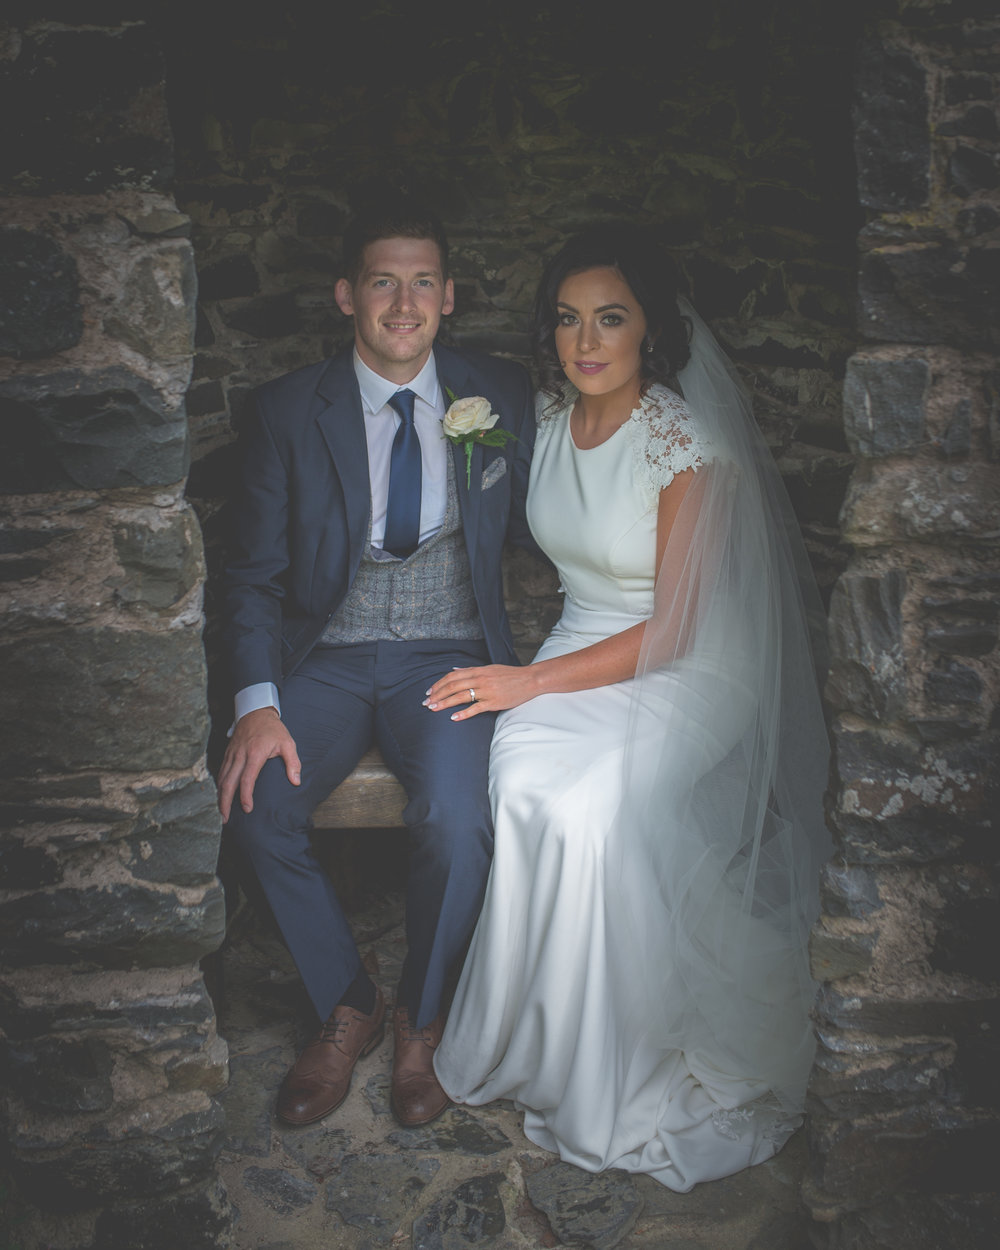 Brian McEwan Wedding Photography | Carol-Anne & Sean | The Portraits-54.jpg